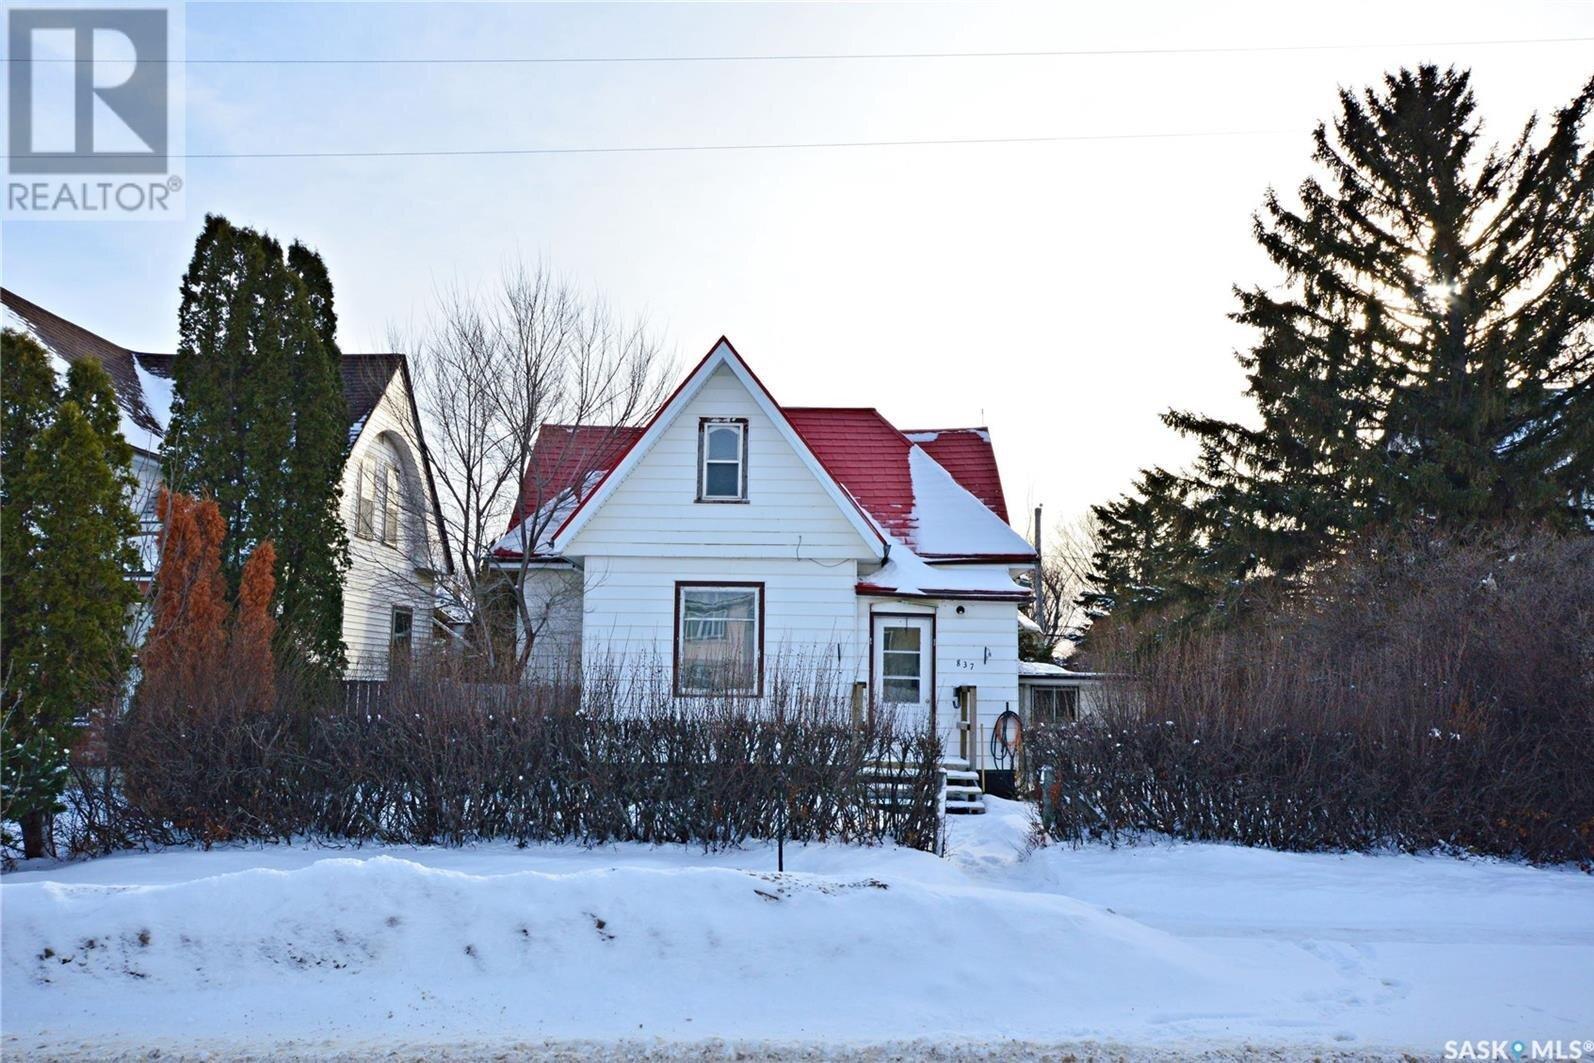 House for sale at 837 Athabasca St W Moose Jaw Saskatchewan - MLS: SK827311